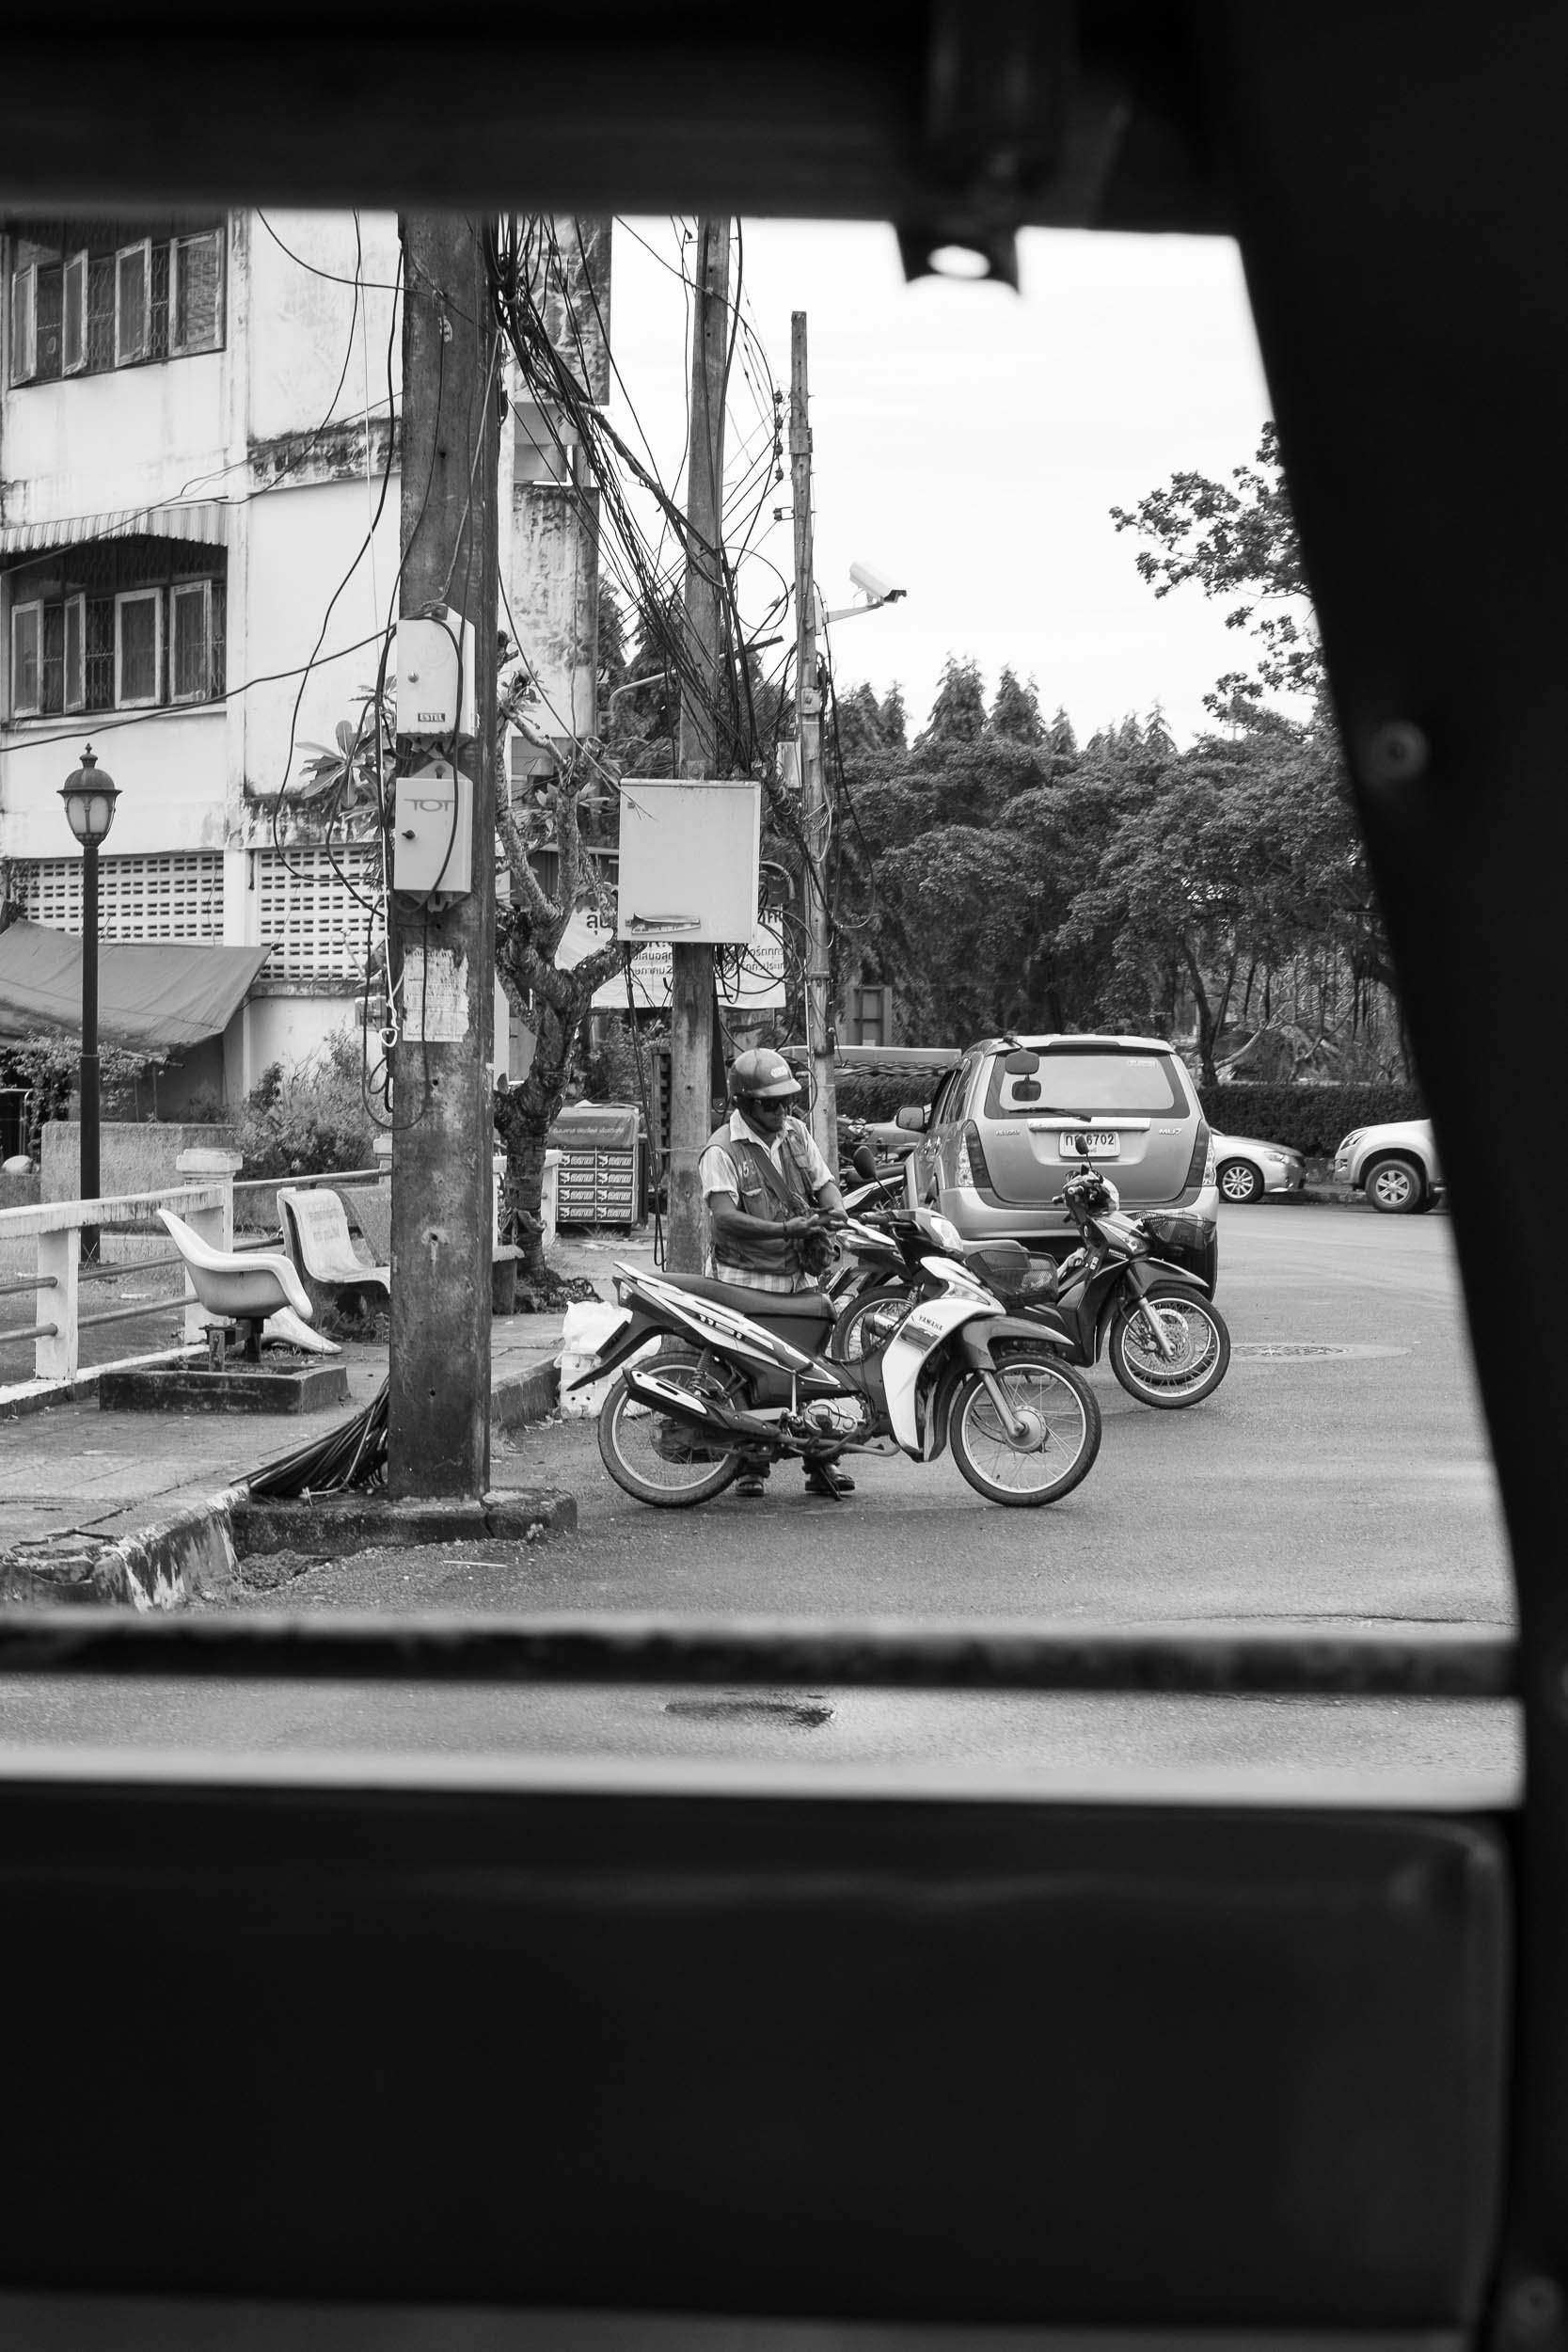 thailand-49.jpg